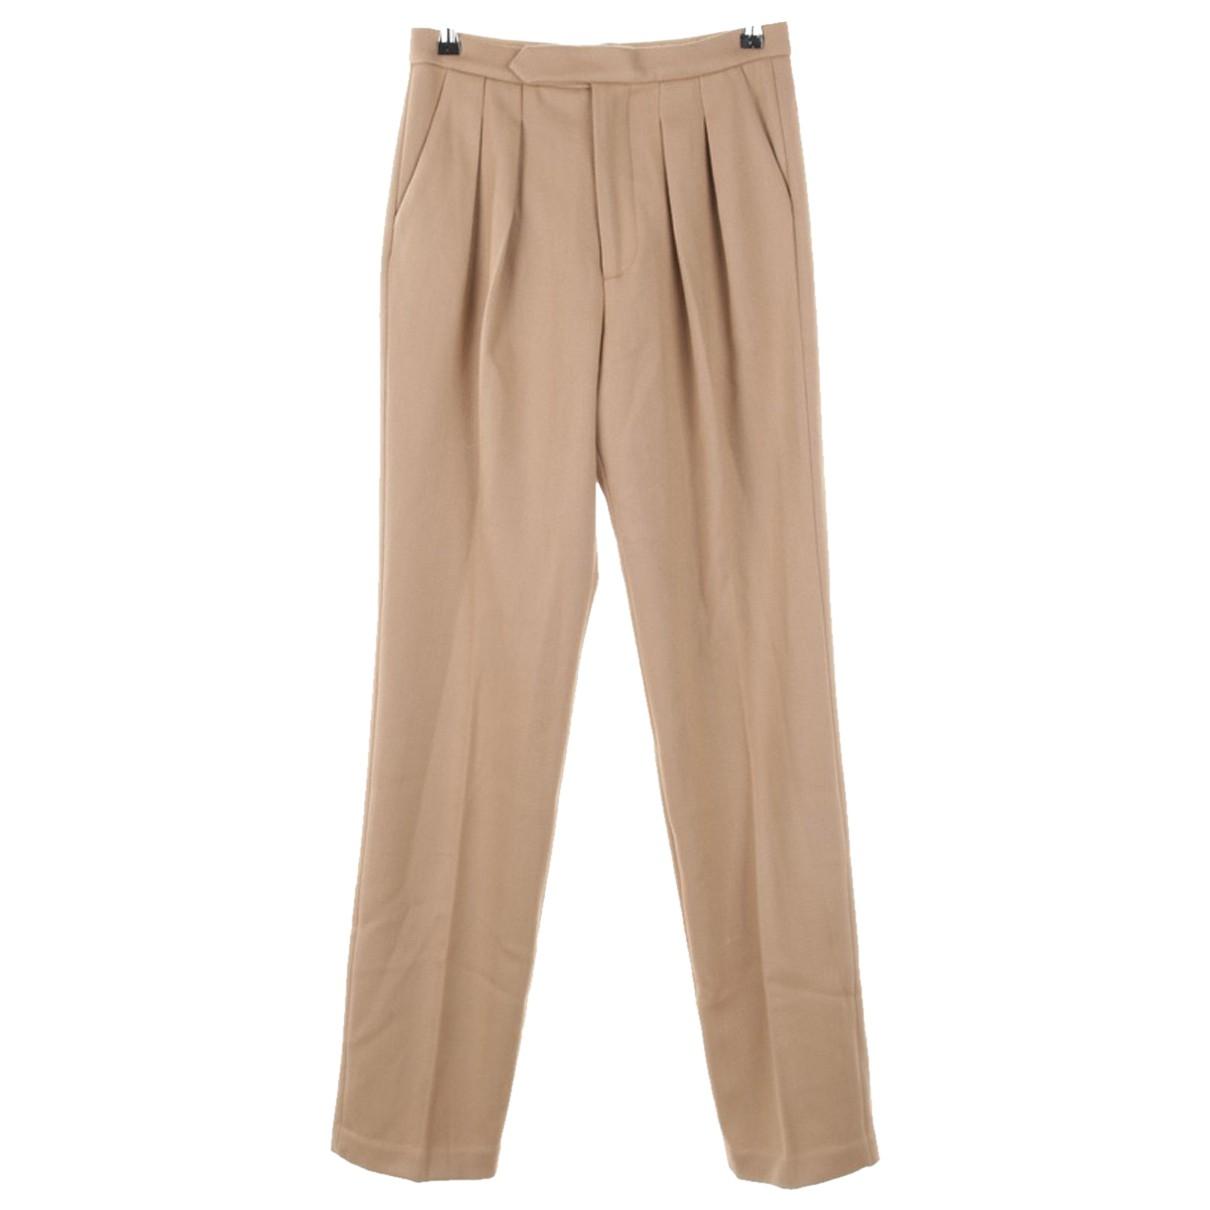 Anine Bing Wool trousers